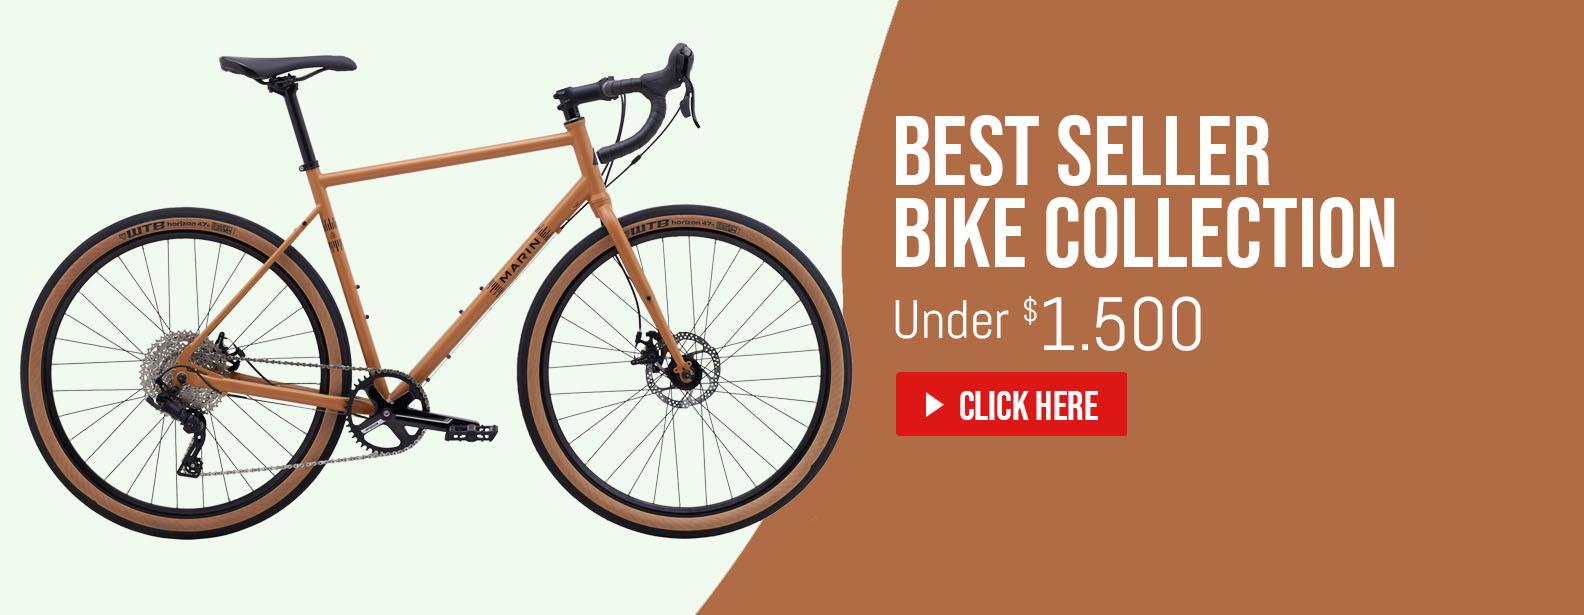 Buy Best Seller Bike Collection